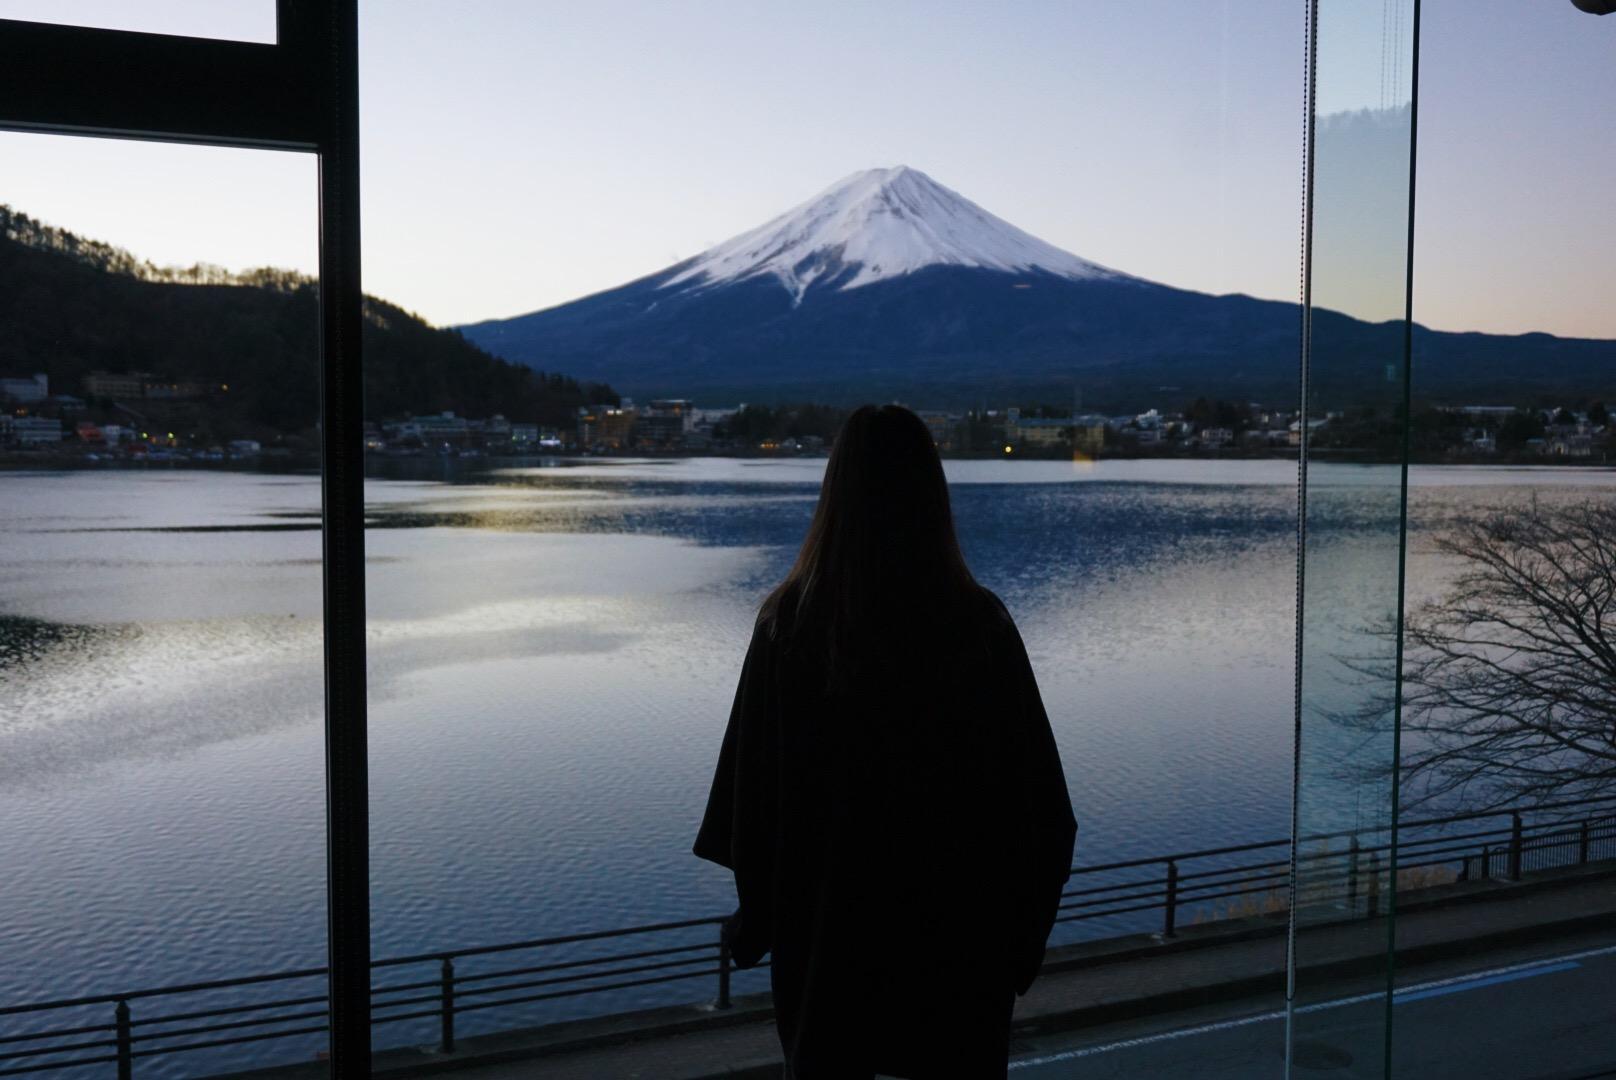 morning view Lake Kawaguchiko and Mount Fuji